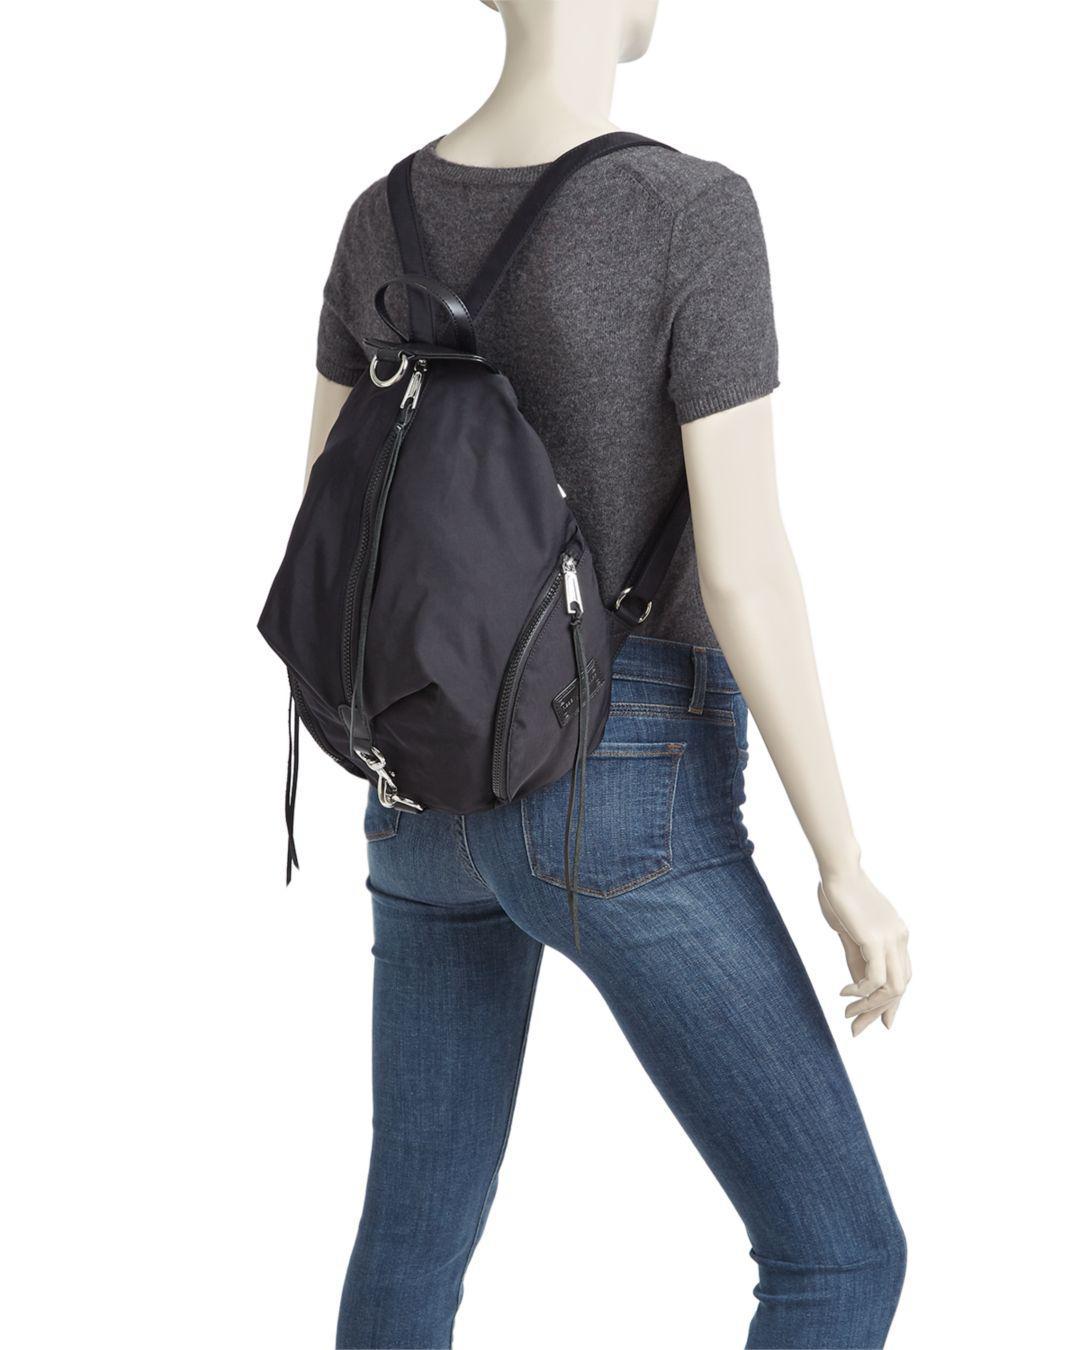 Lyst - Rebecca Minkoff Julian Nylon Backpack in Black aef0cad031713